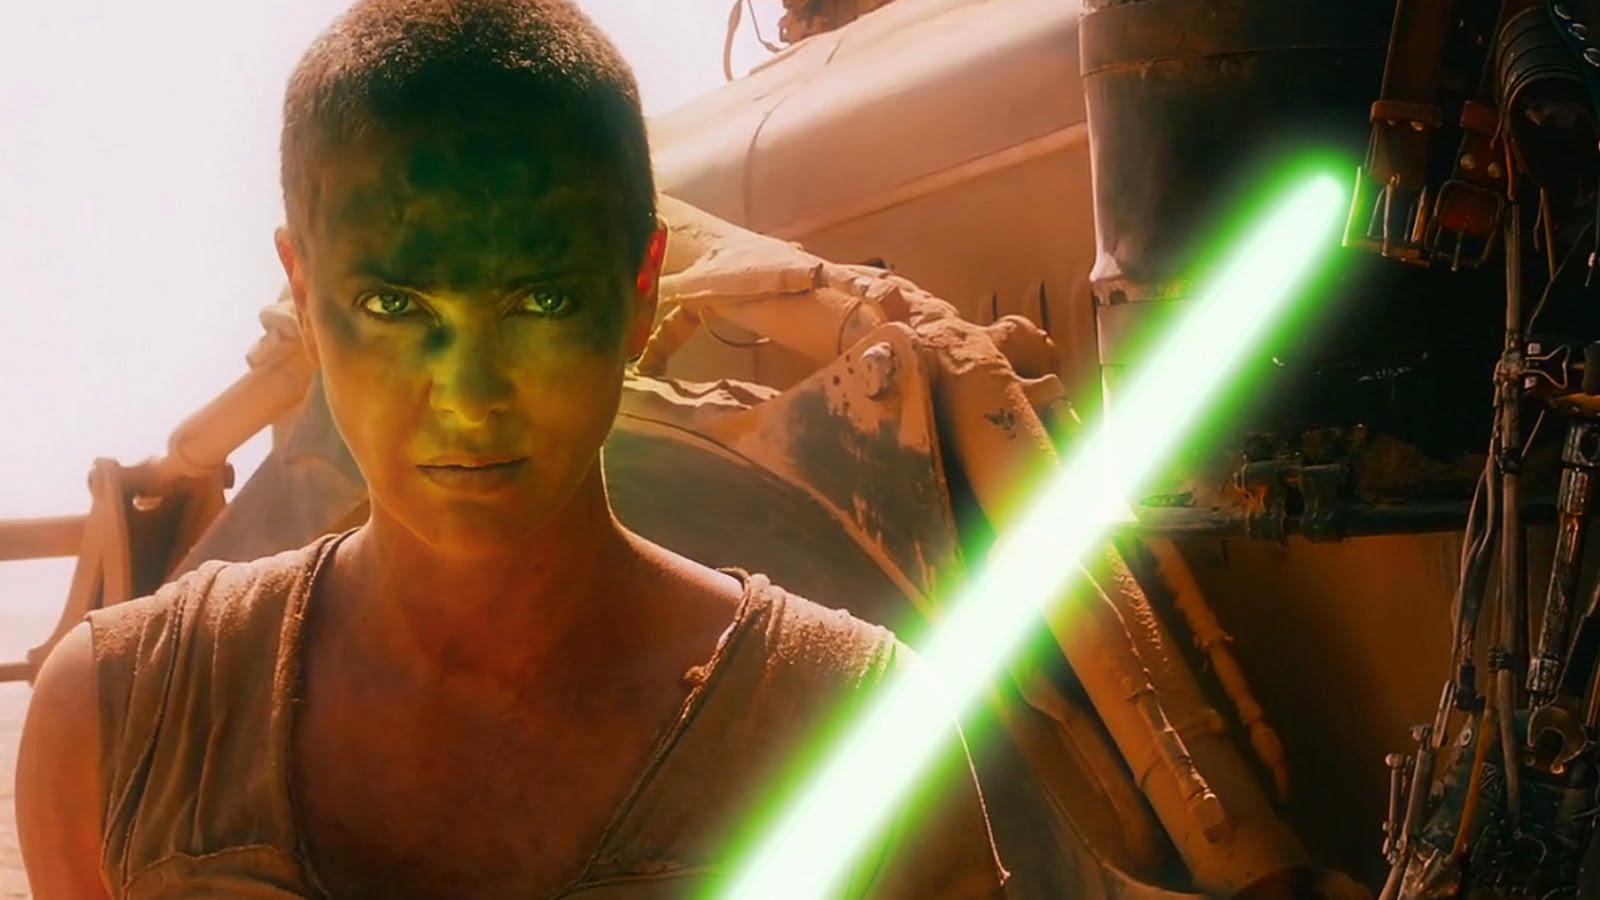 ROAD WARS - The Imperator Strikes Back (Mad Max/Star Wars Mashup)